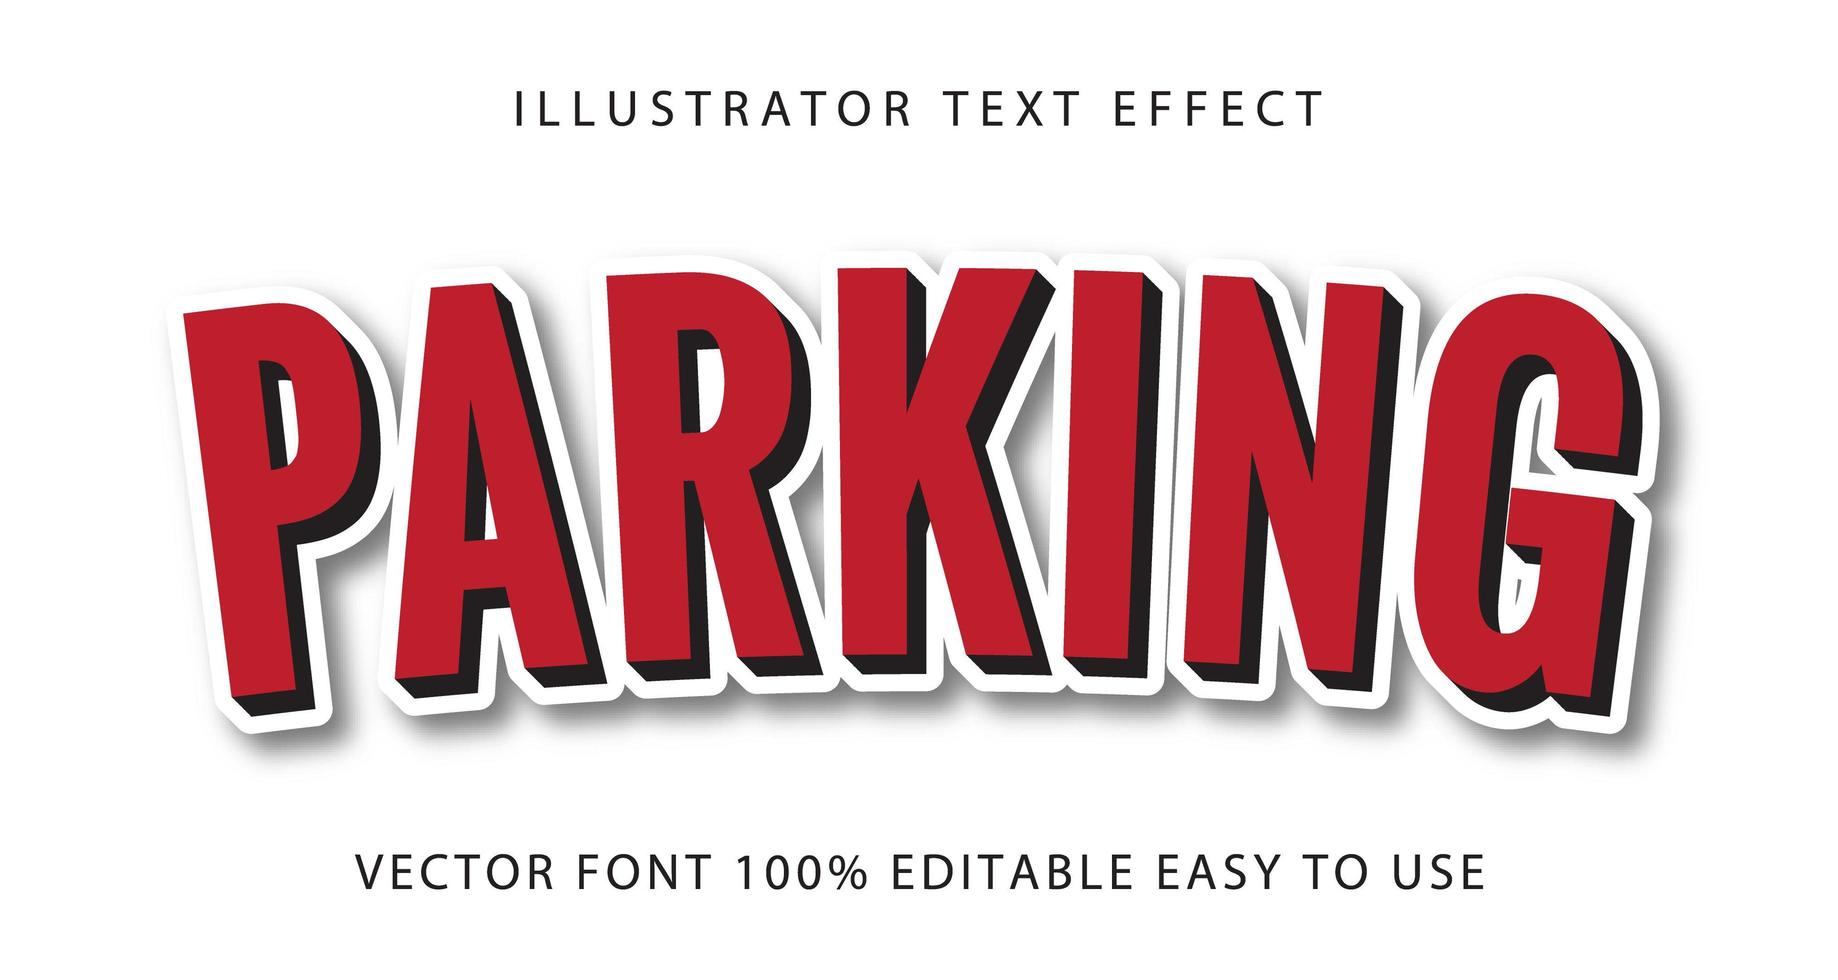 parkeren rode, witte contour tekst effect vector